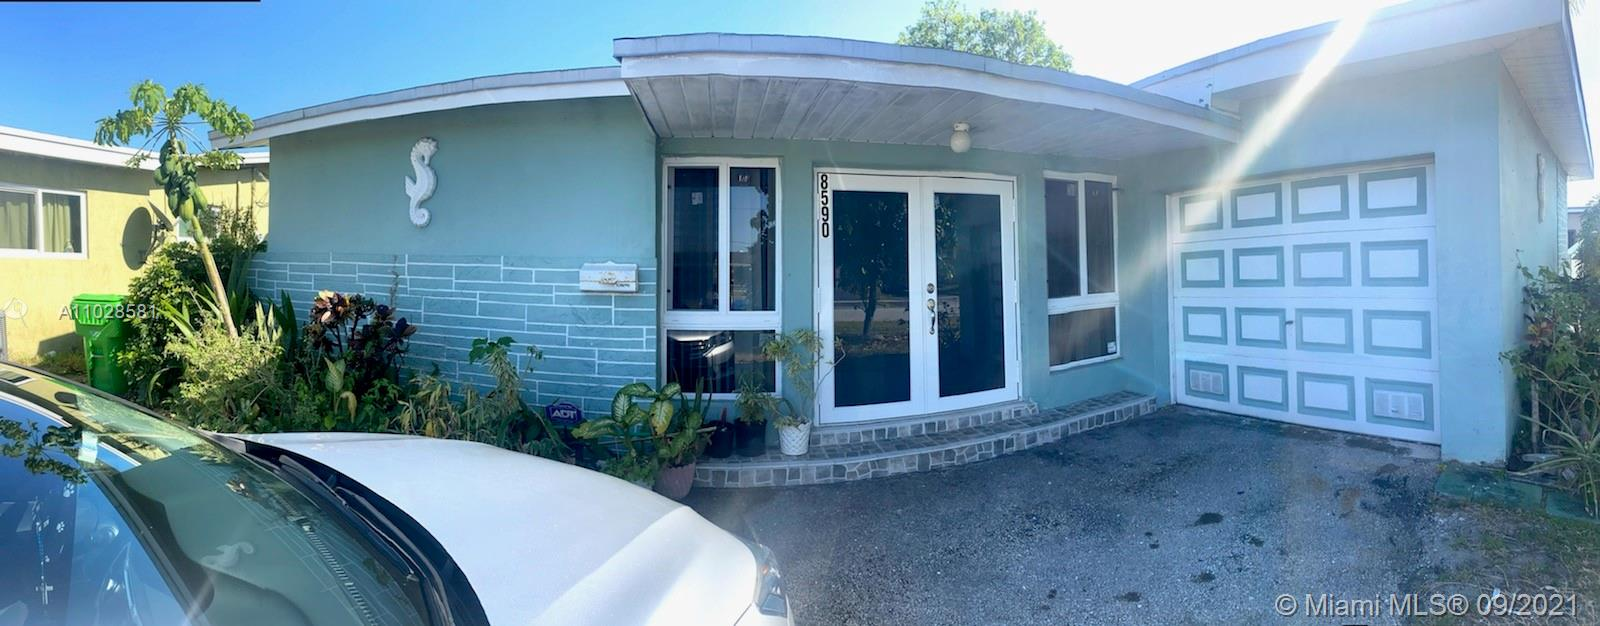 Sunrise Golf Village - 8590 NW 25th Ct, Sunrise, FL 33322